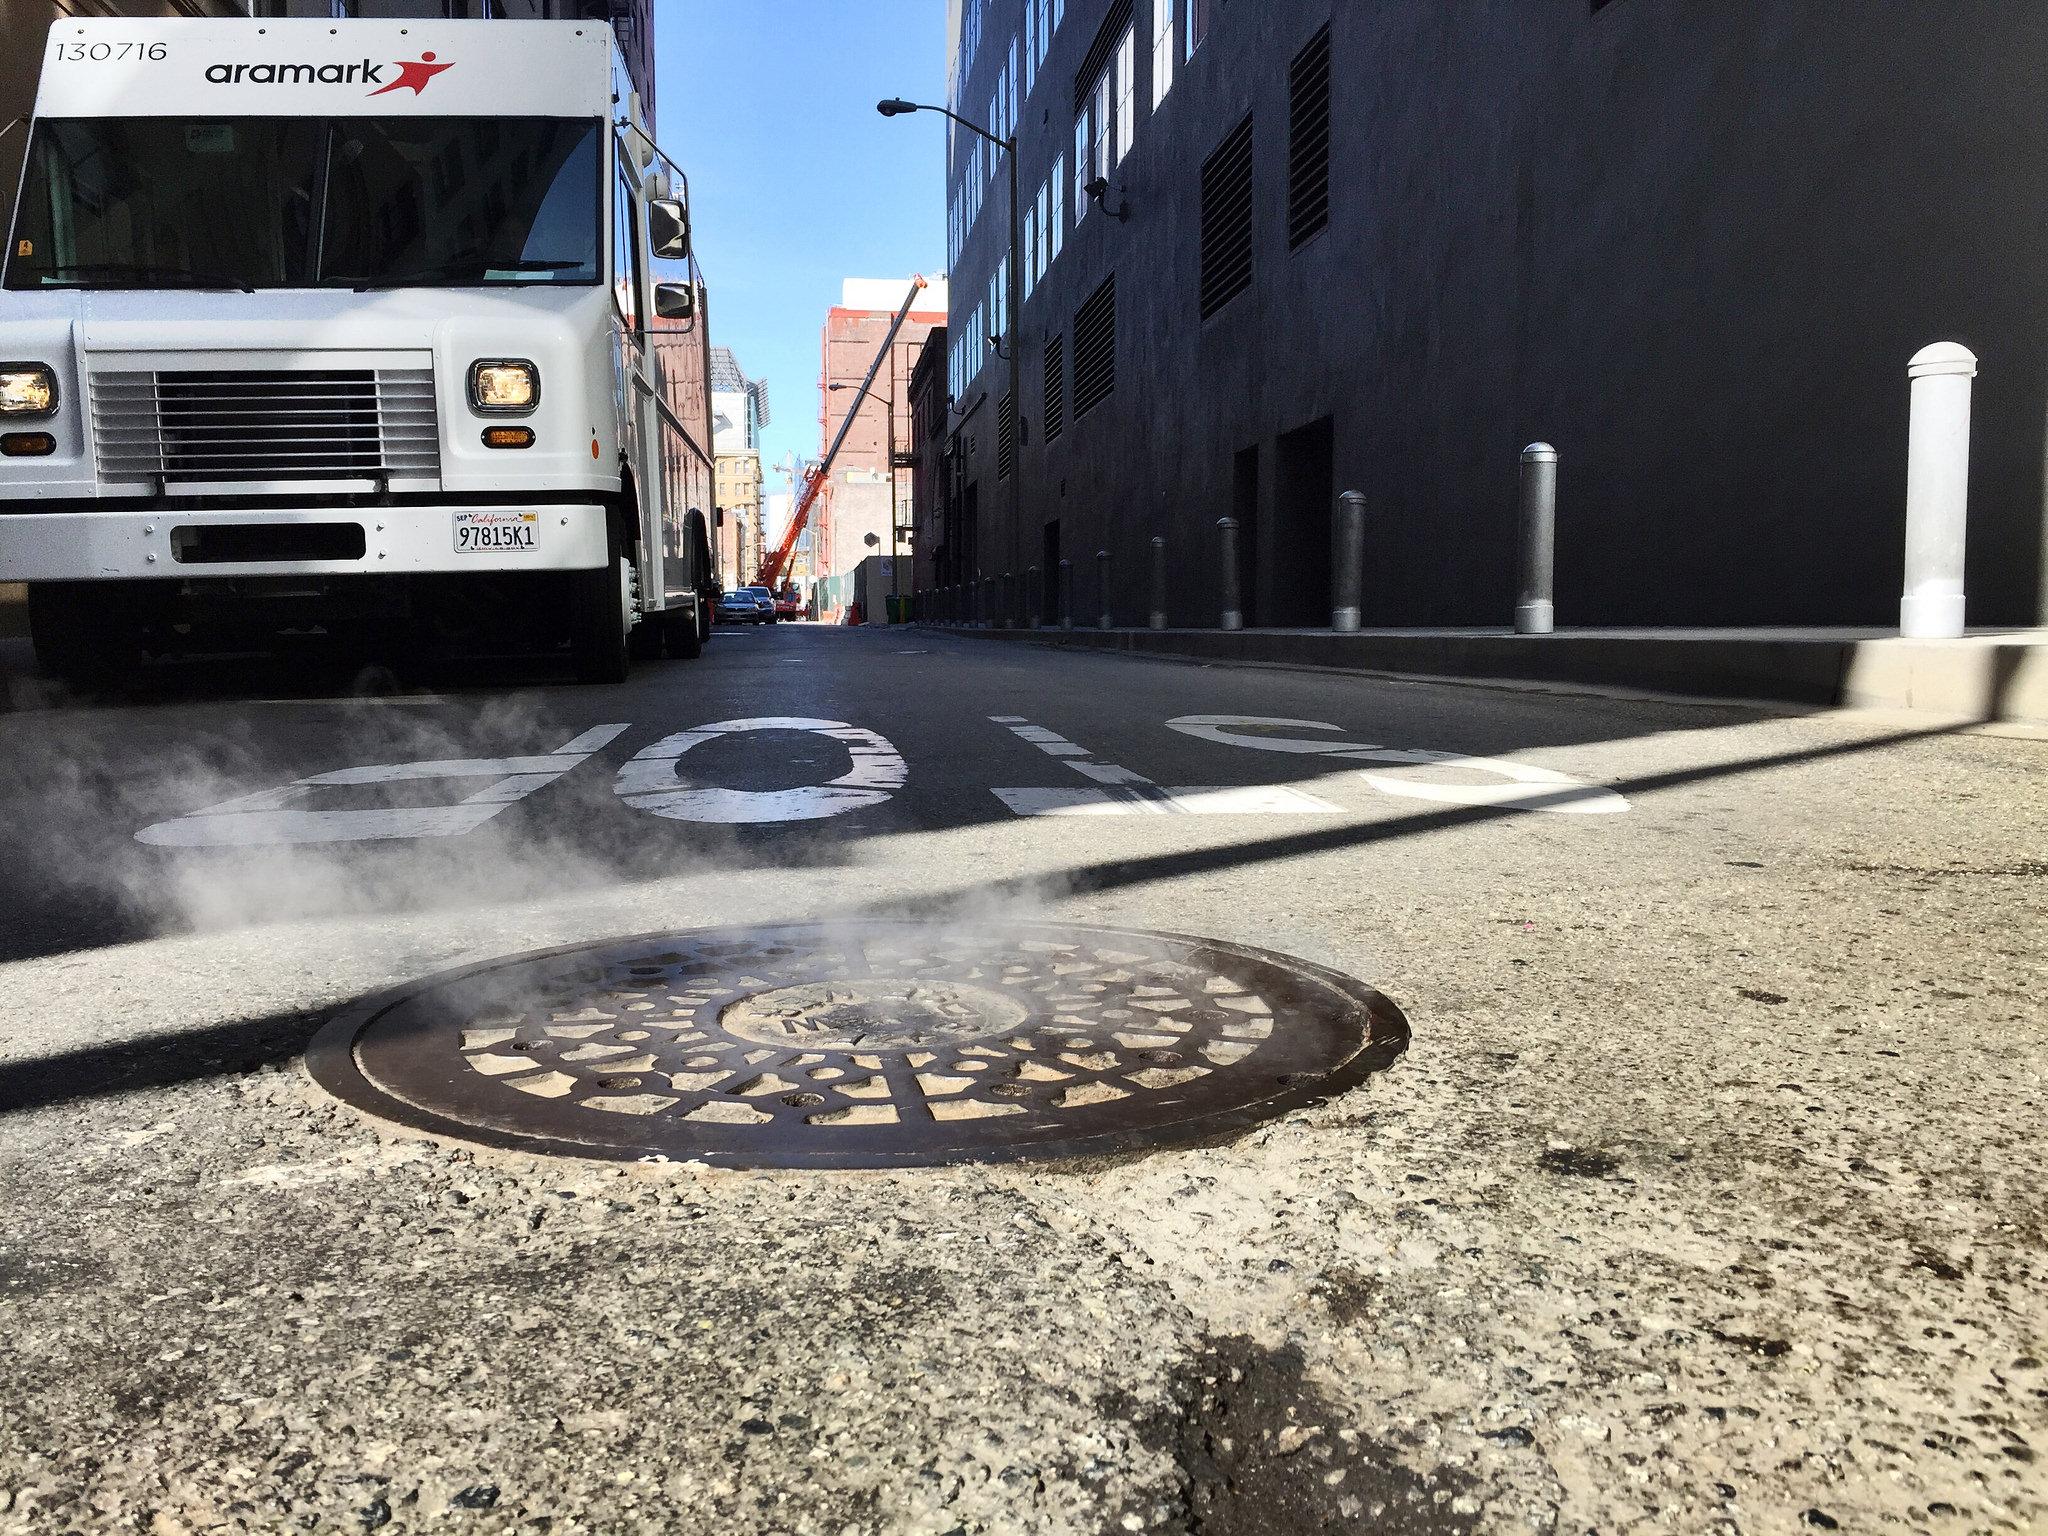 milwaukee city steam manhole cover aramark truck